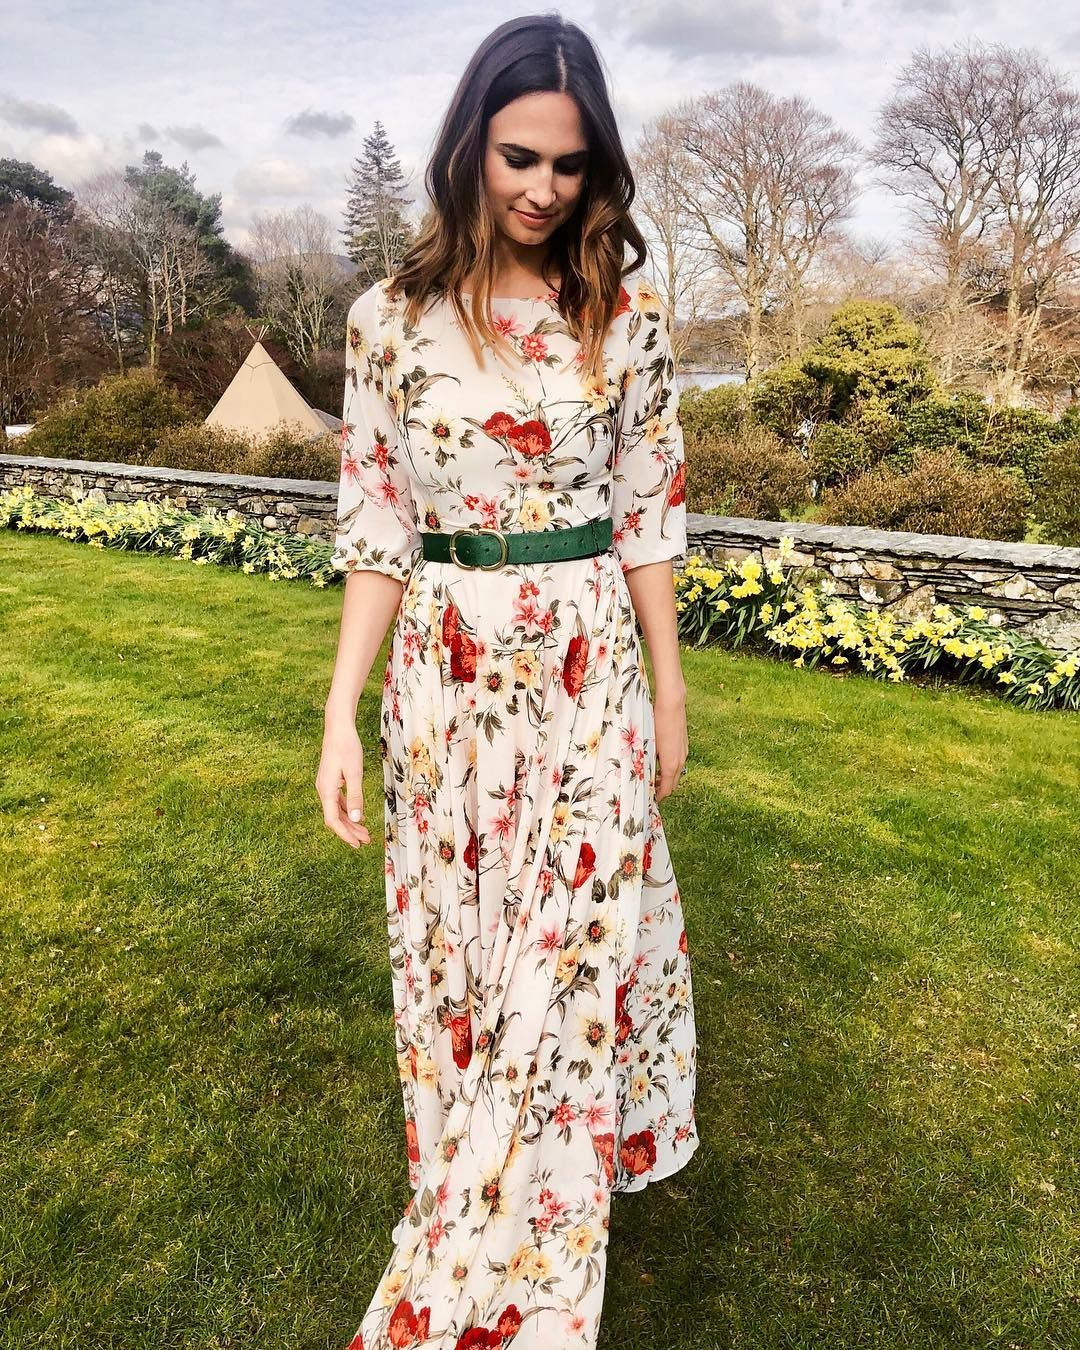 Alicemeliajeffrey In The Giselle Maxi Floral Maxi Long Sleeve Maxi Wedding Season Wedding Guest Dress Wedding Party Dresses Guest Dresses [ 1350 x 1080 Pixel ]